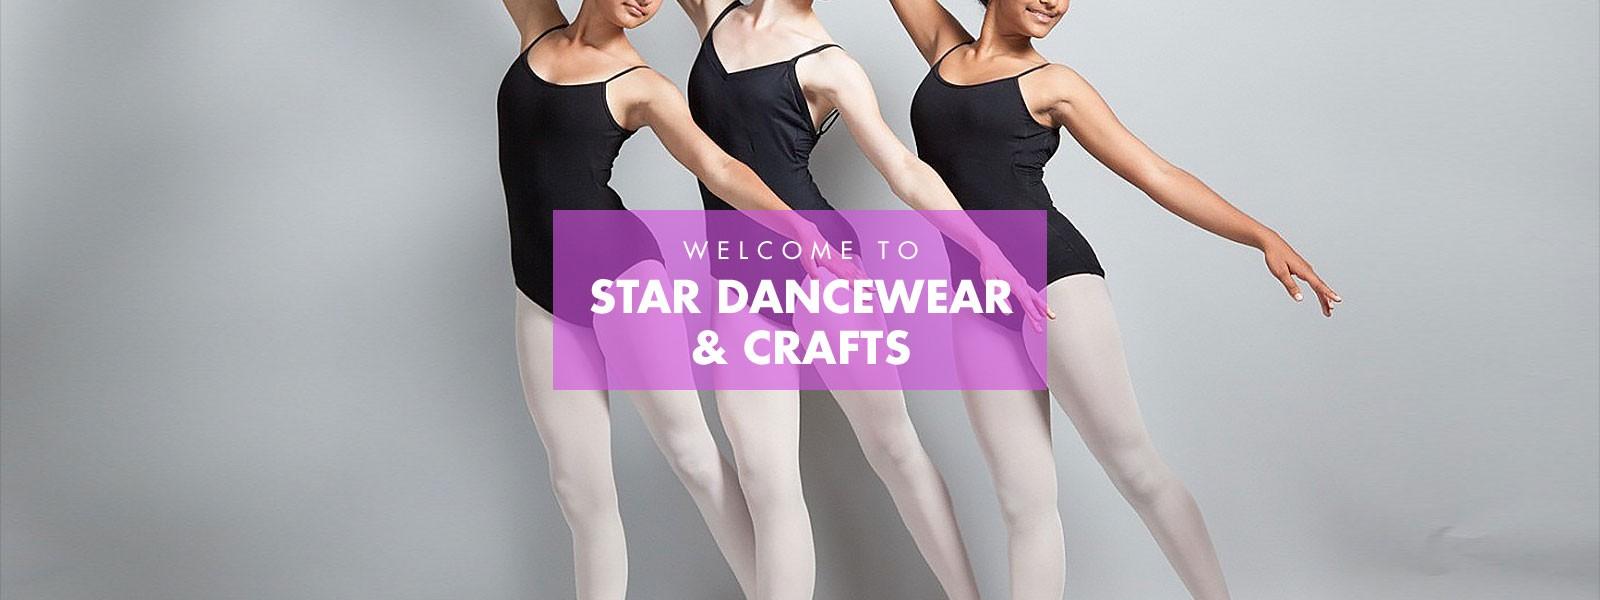 Welcome to Star Dancewear & Crafts